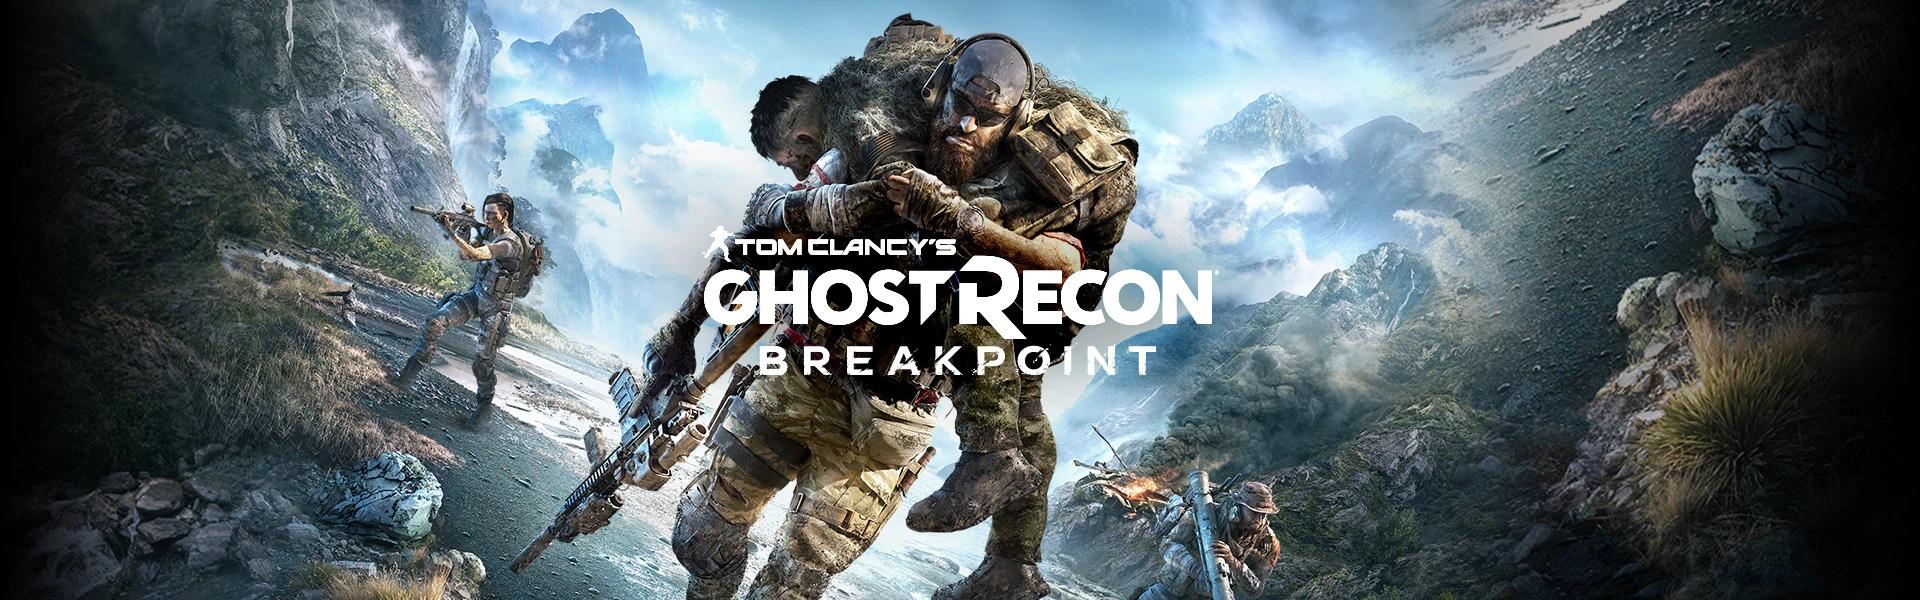 Otwarta beta Ghost Recon Breakpoint już za tydzień 23